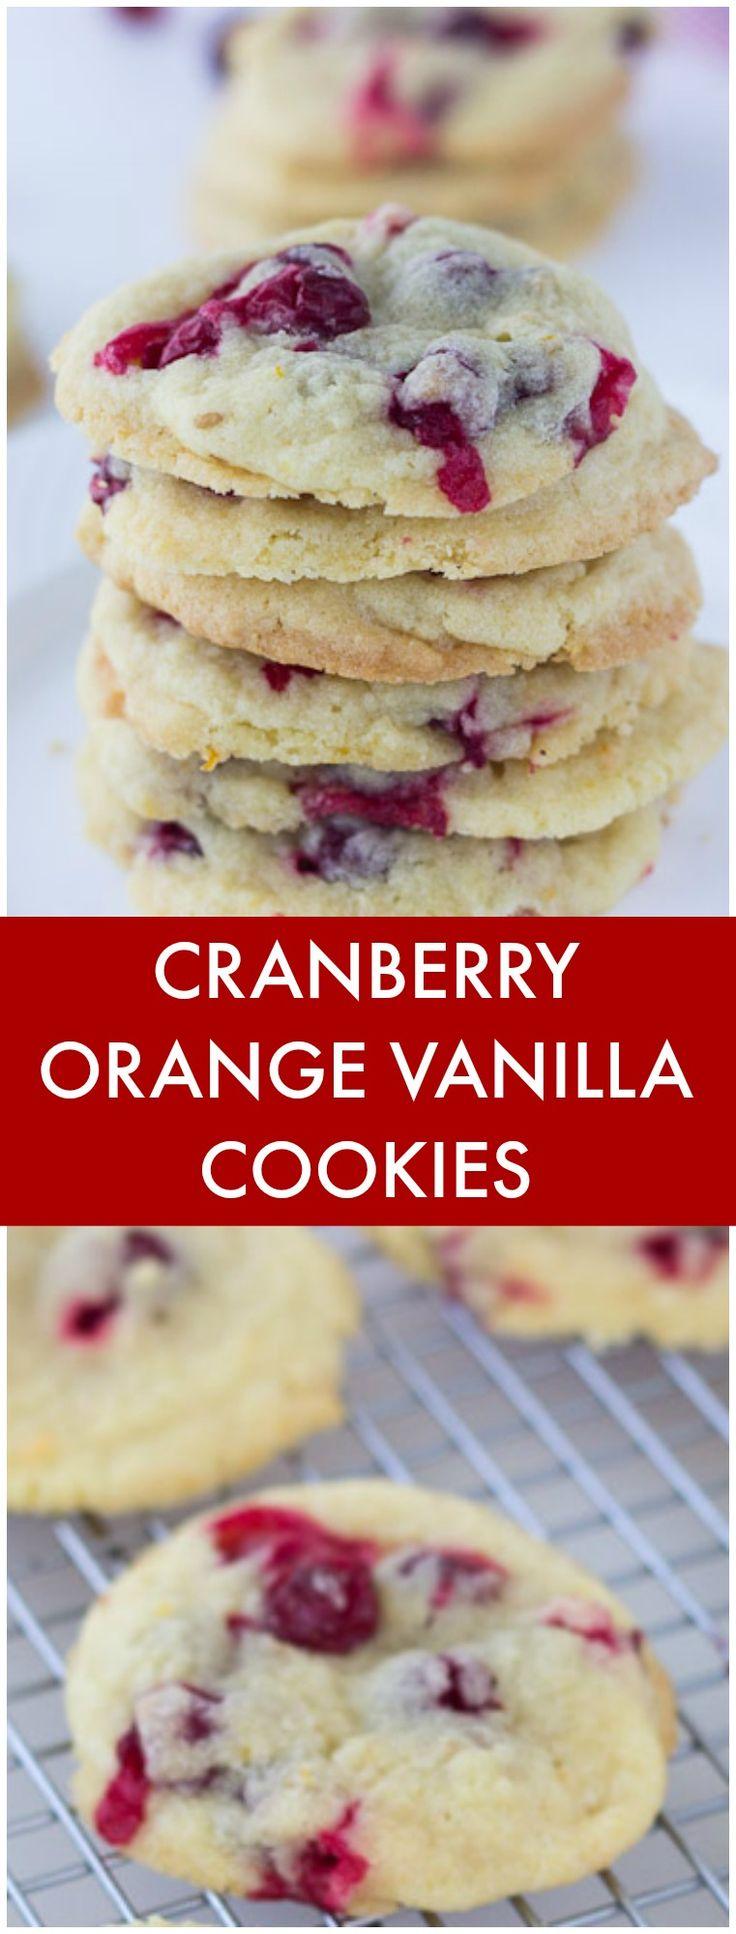 Best 25+ Vanilla sugar ideas on Pinterest | Vanilla sugar ...